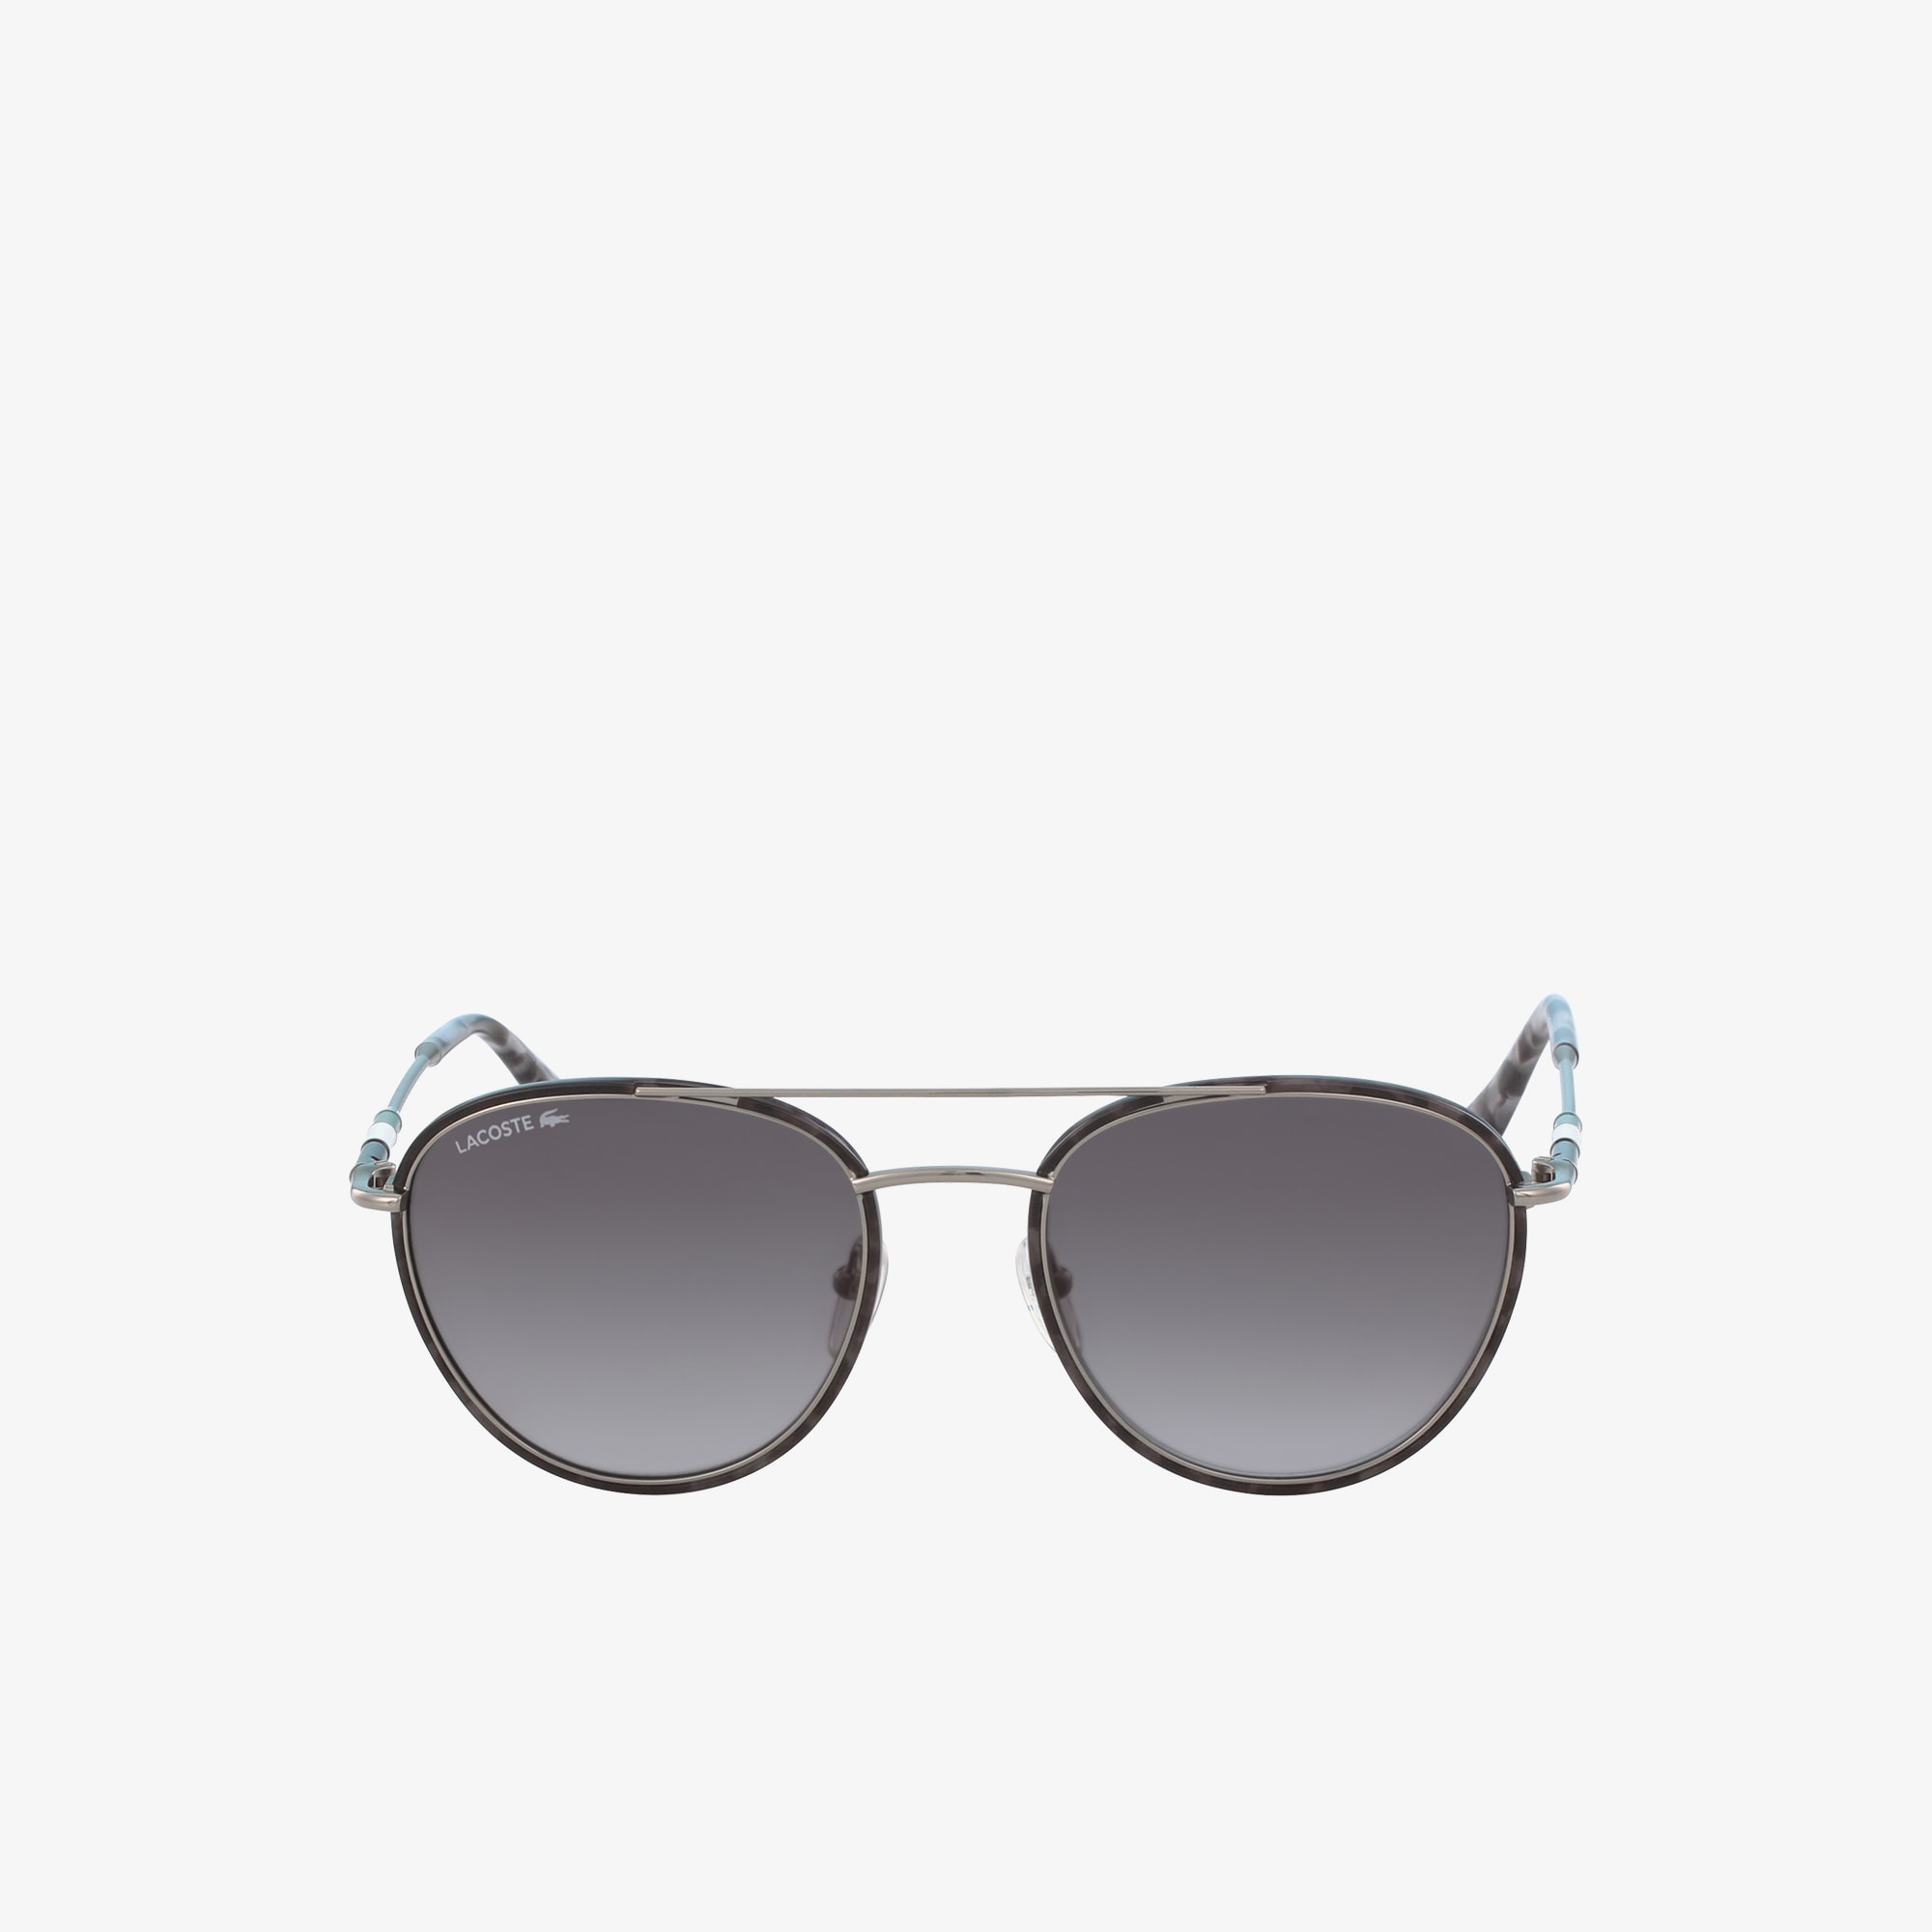 Oval Metal Novak Djokovic Collection Sunglasses